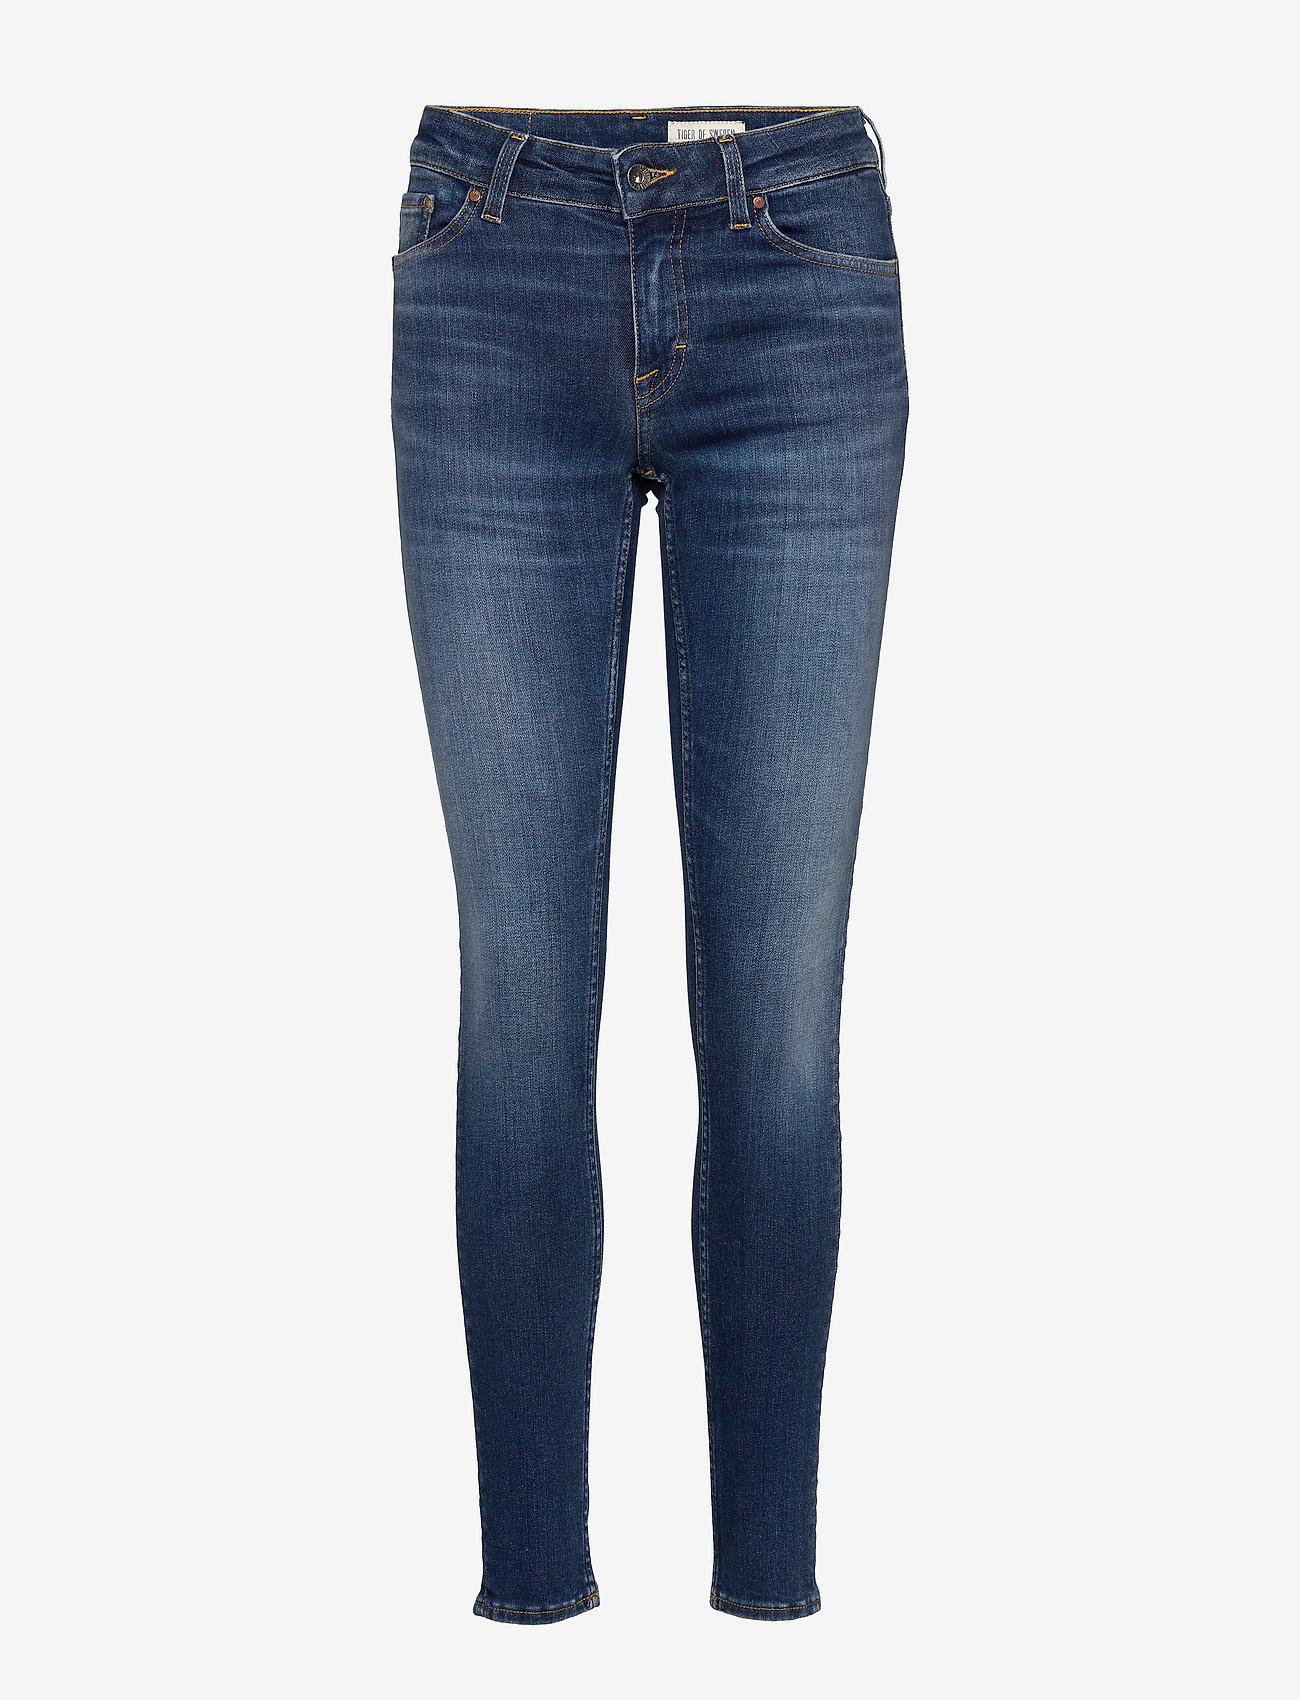 Tiger of Sweden Jeans - SLIGHT - wąskie dżinsy - royal blue - 0